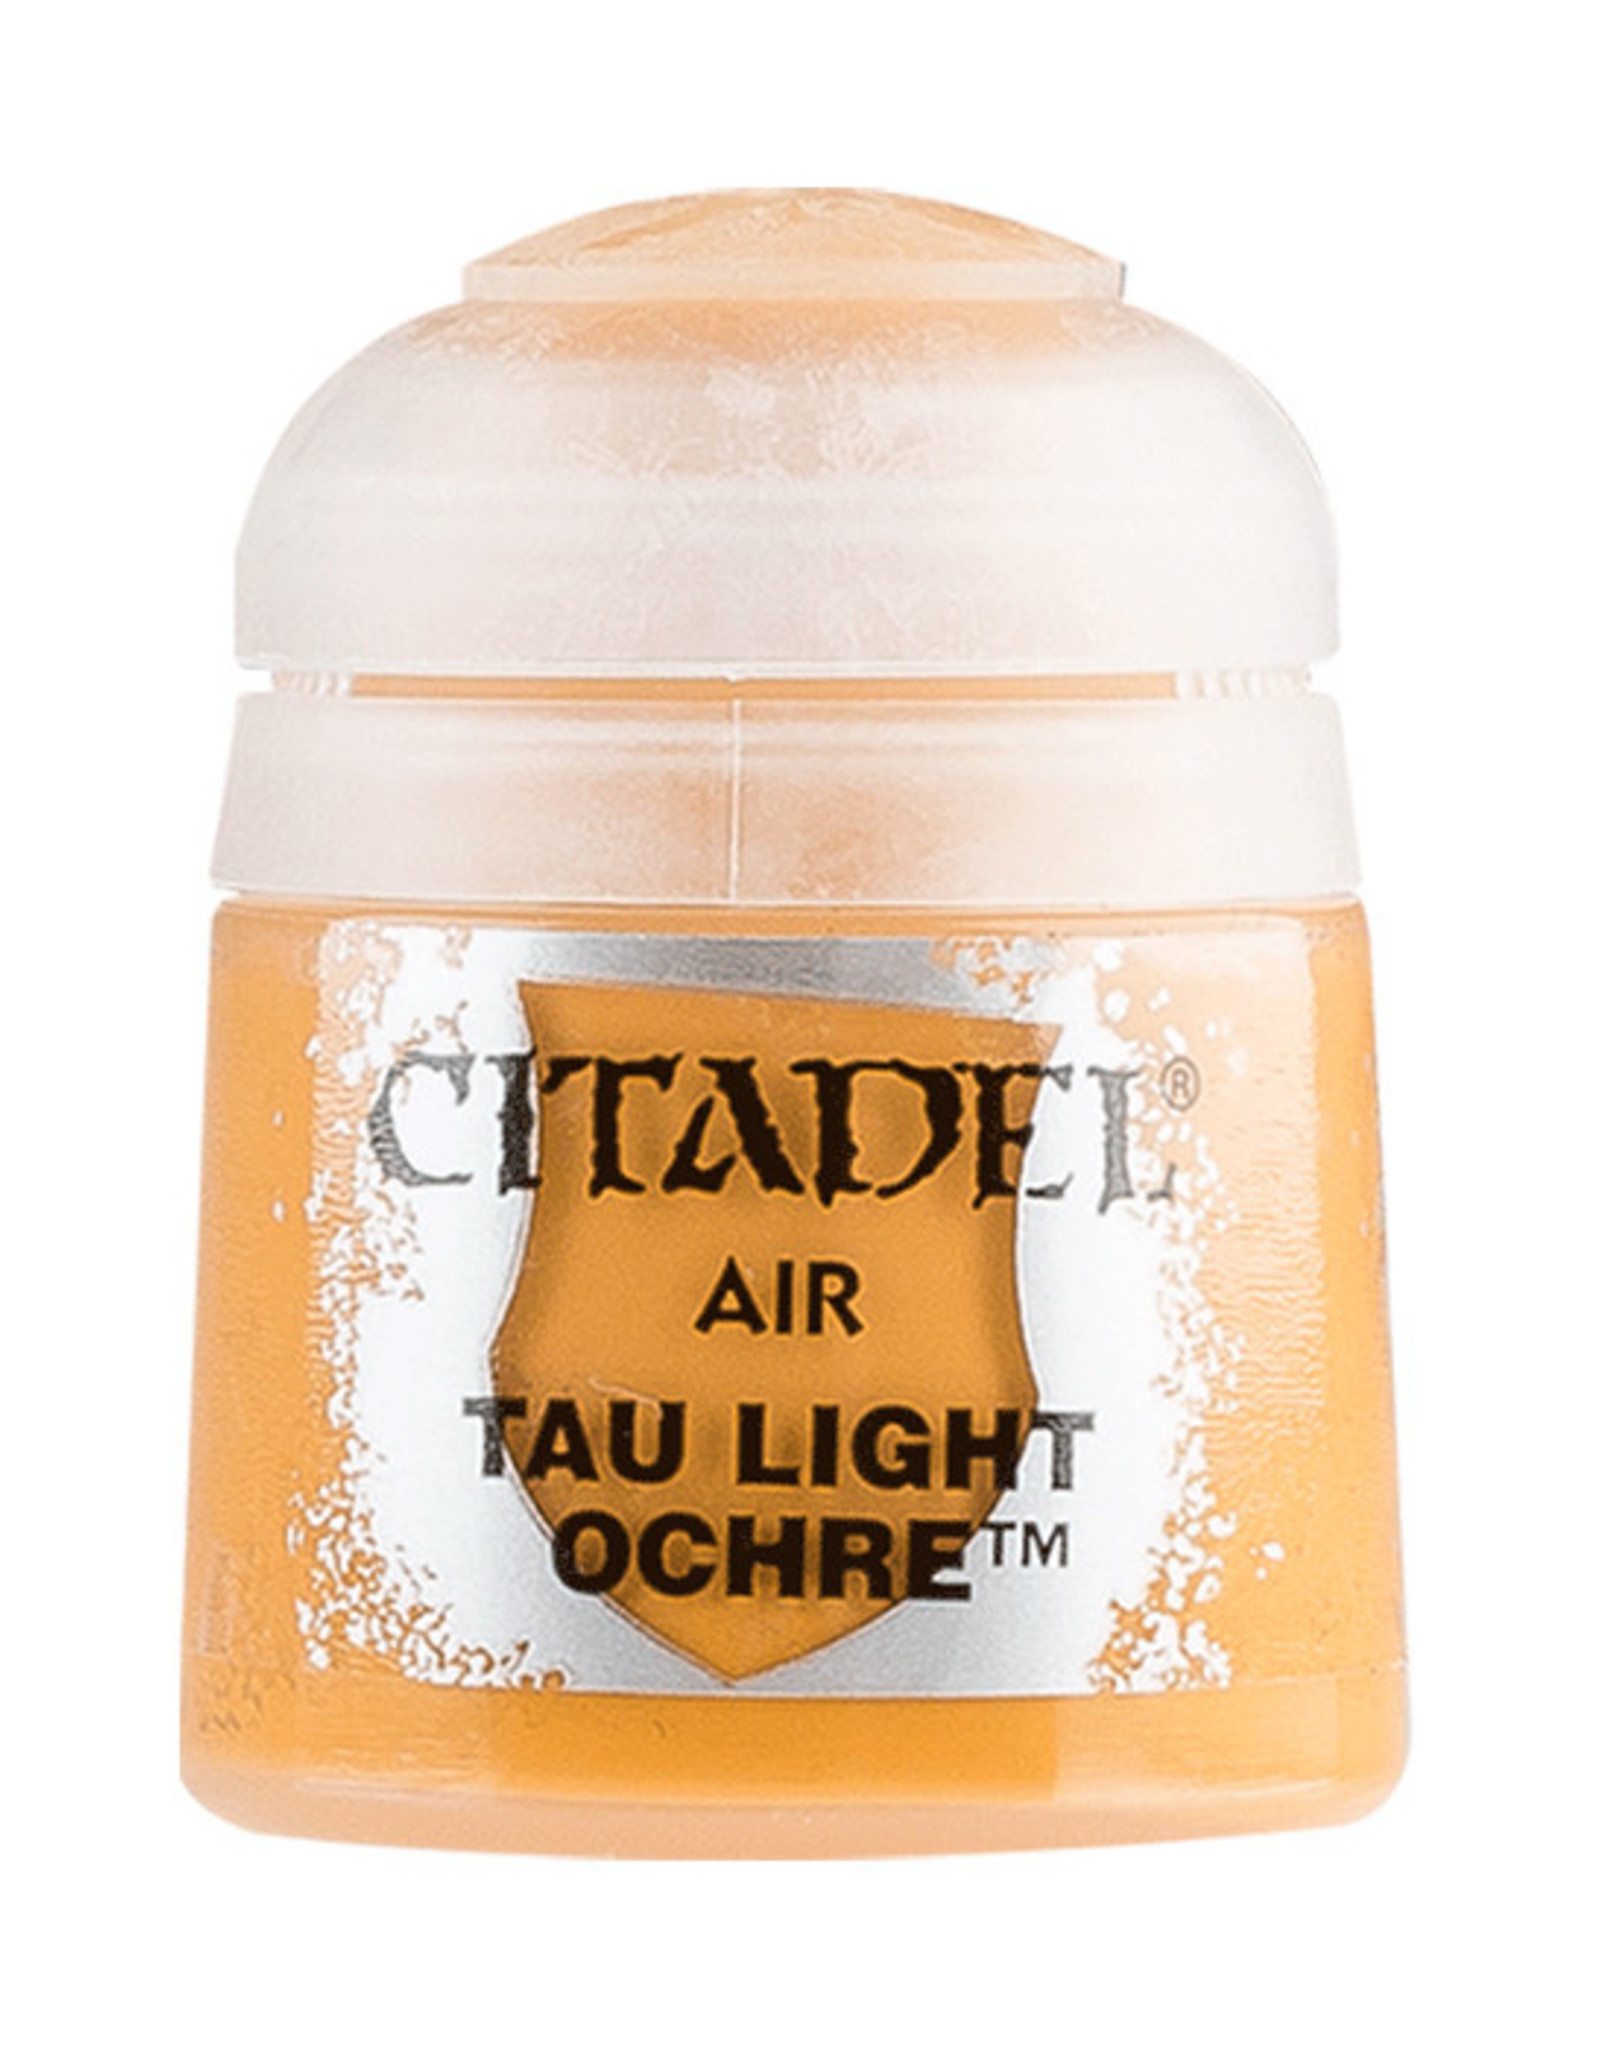 Citadel Citadel Colour: Air - Tau Light Ochre